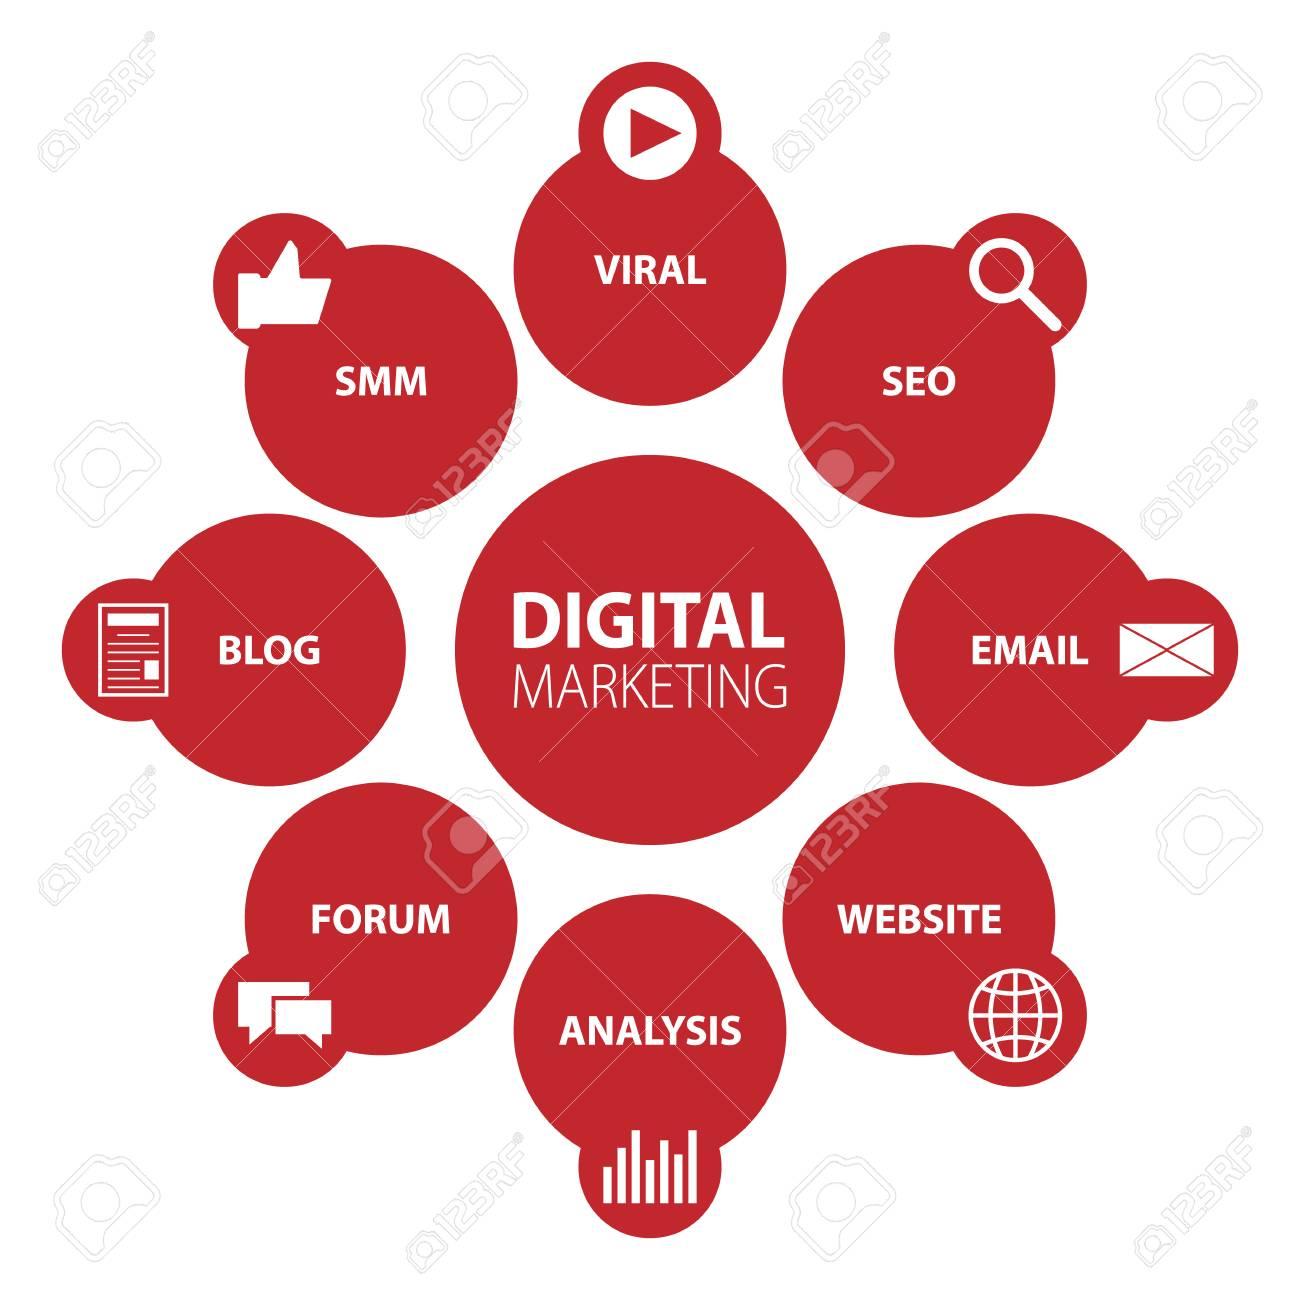 digital marketing vector illustration royalty free cliparts vectors and stock illustration image 76713872 digital marketing vector illustration